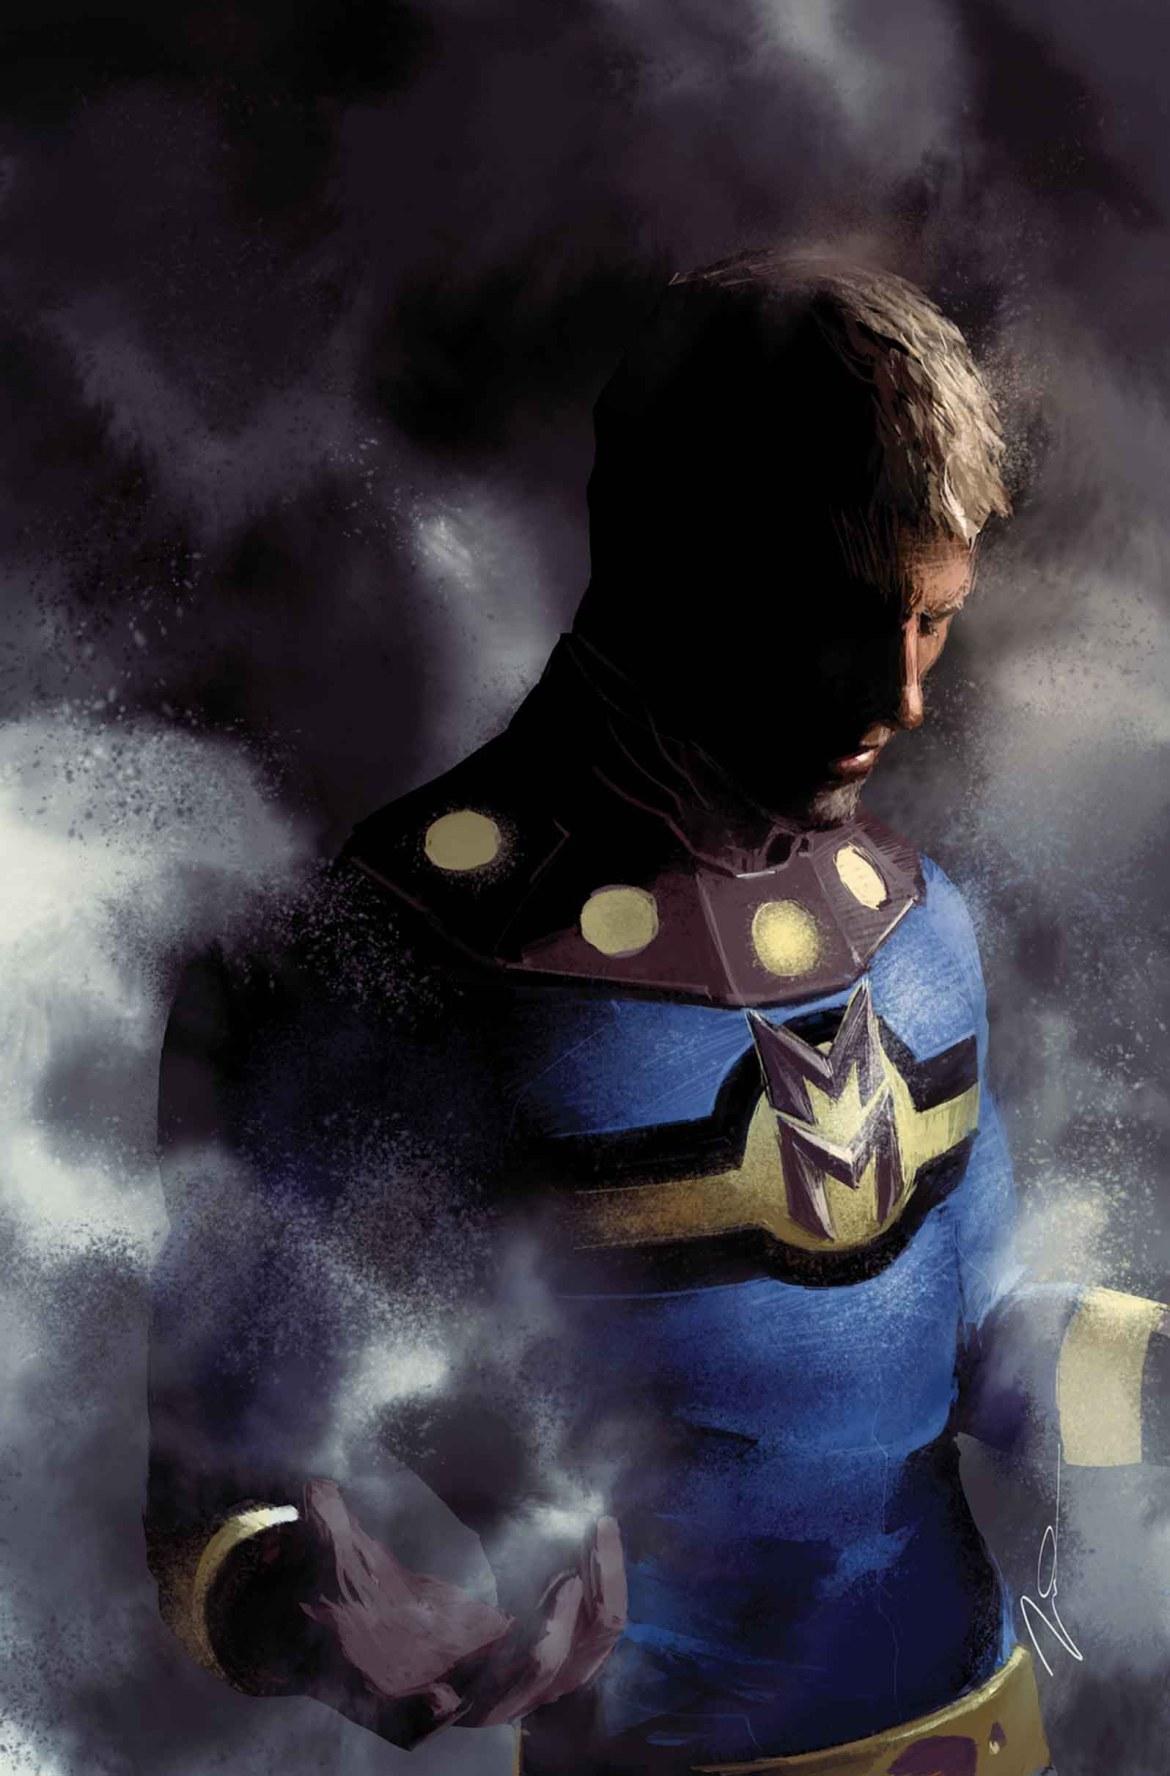 Miracleman – Needless Character Analysis